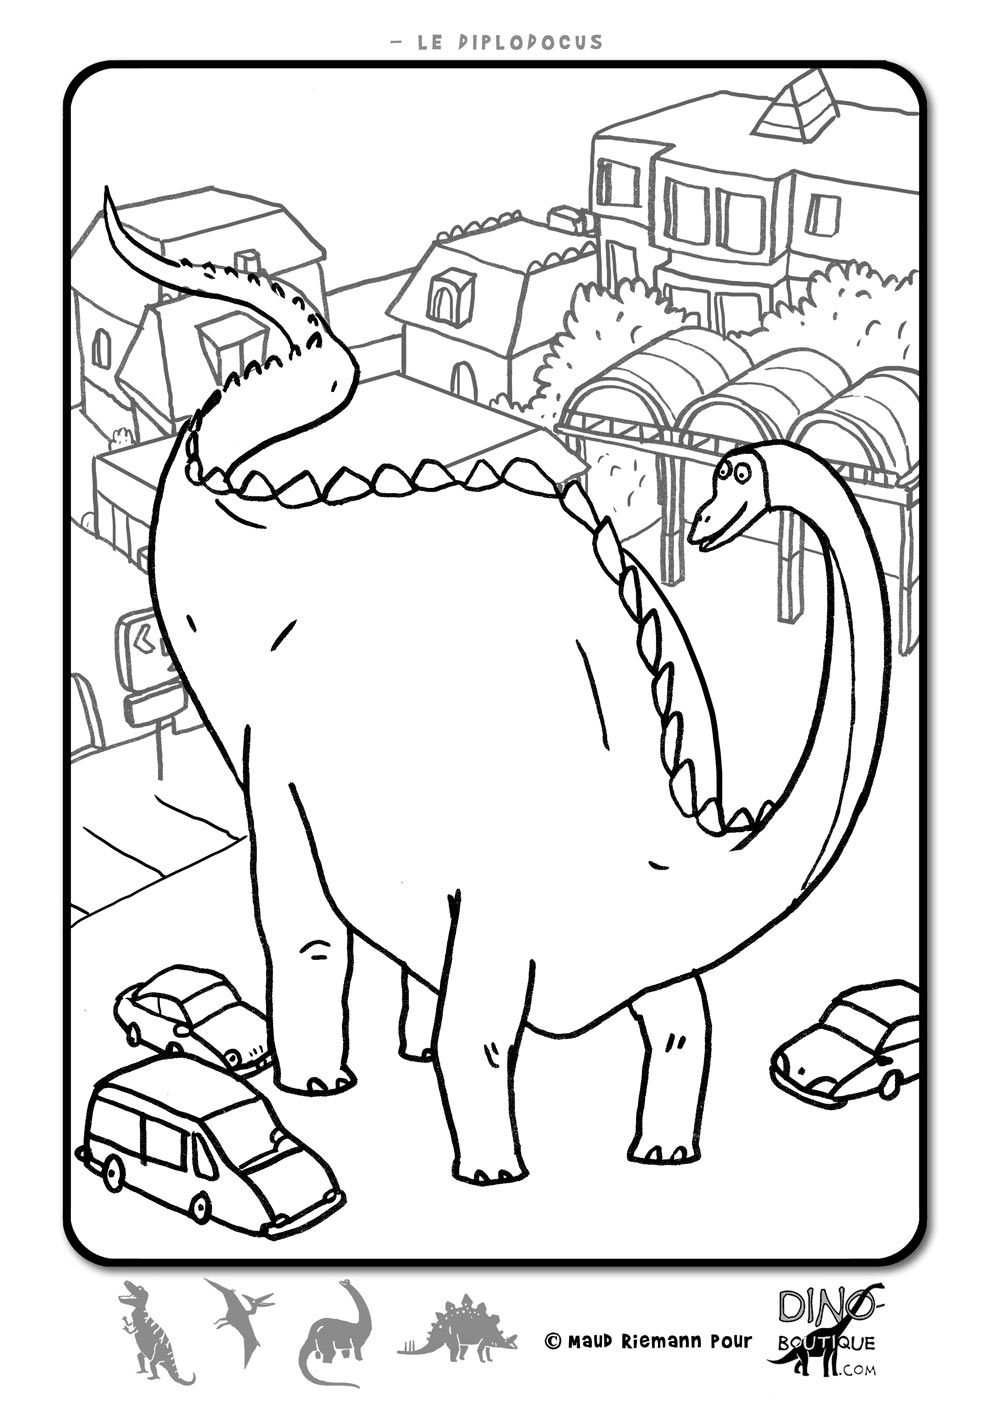 hugo l'escargot coloriage à dessiner dinosaure